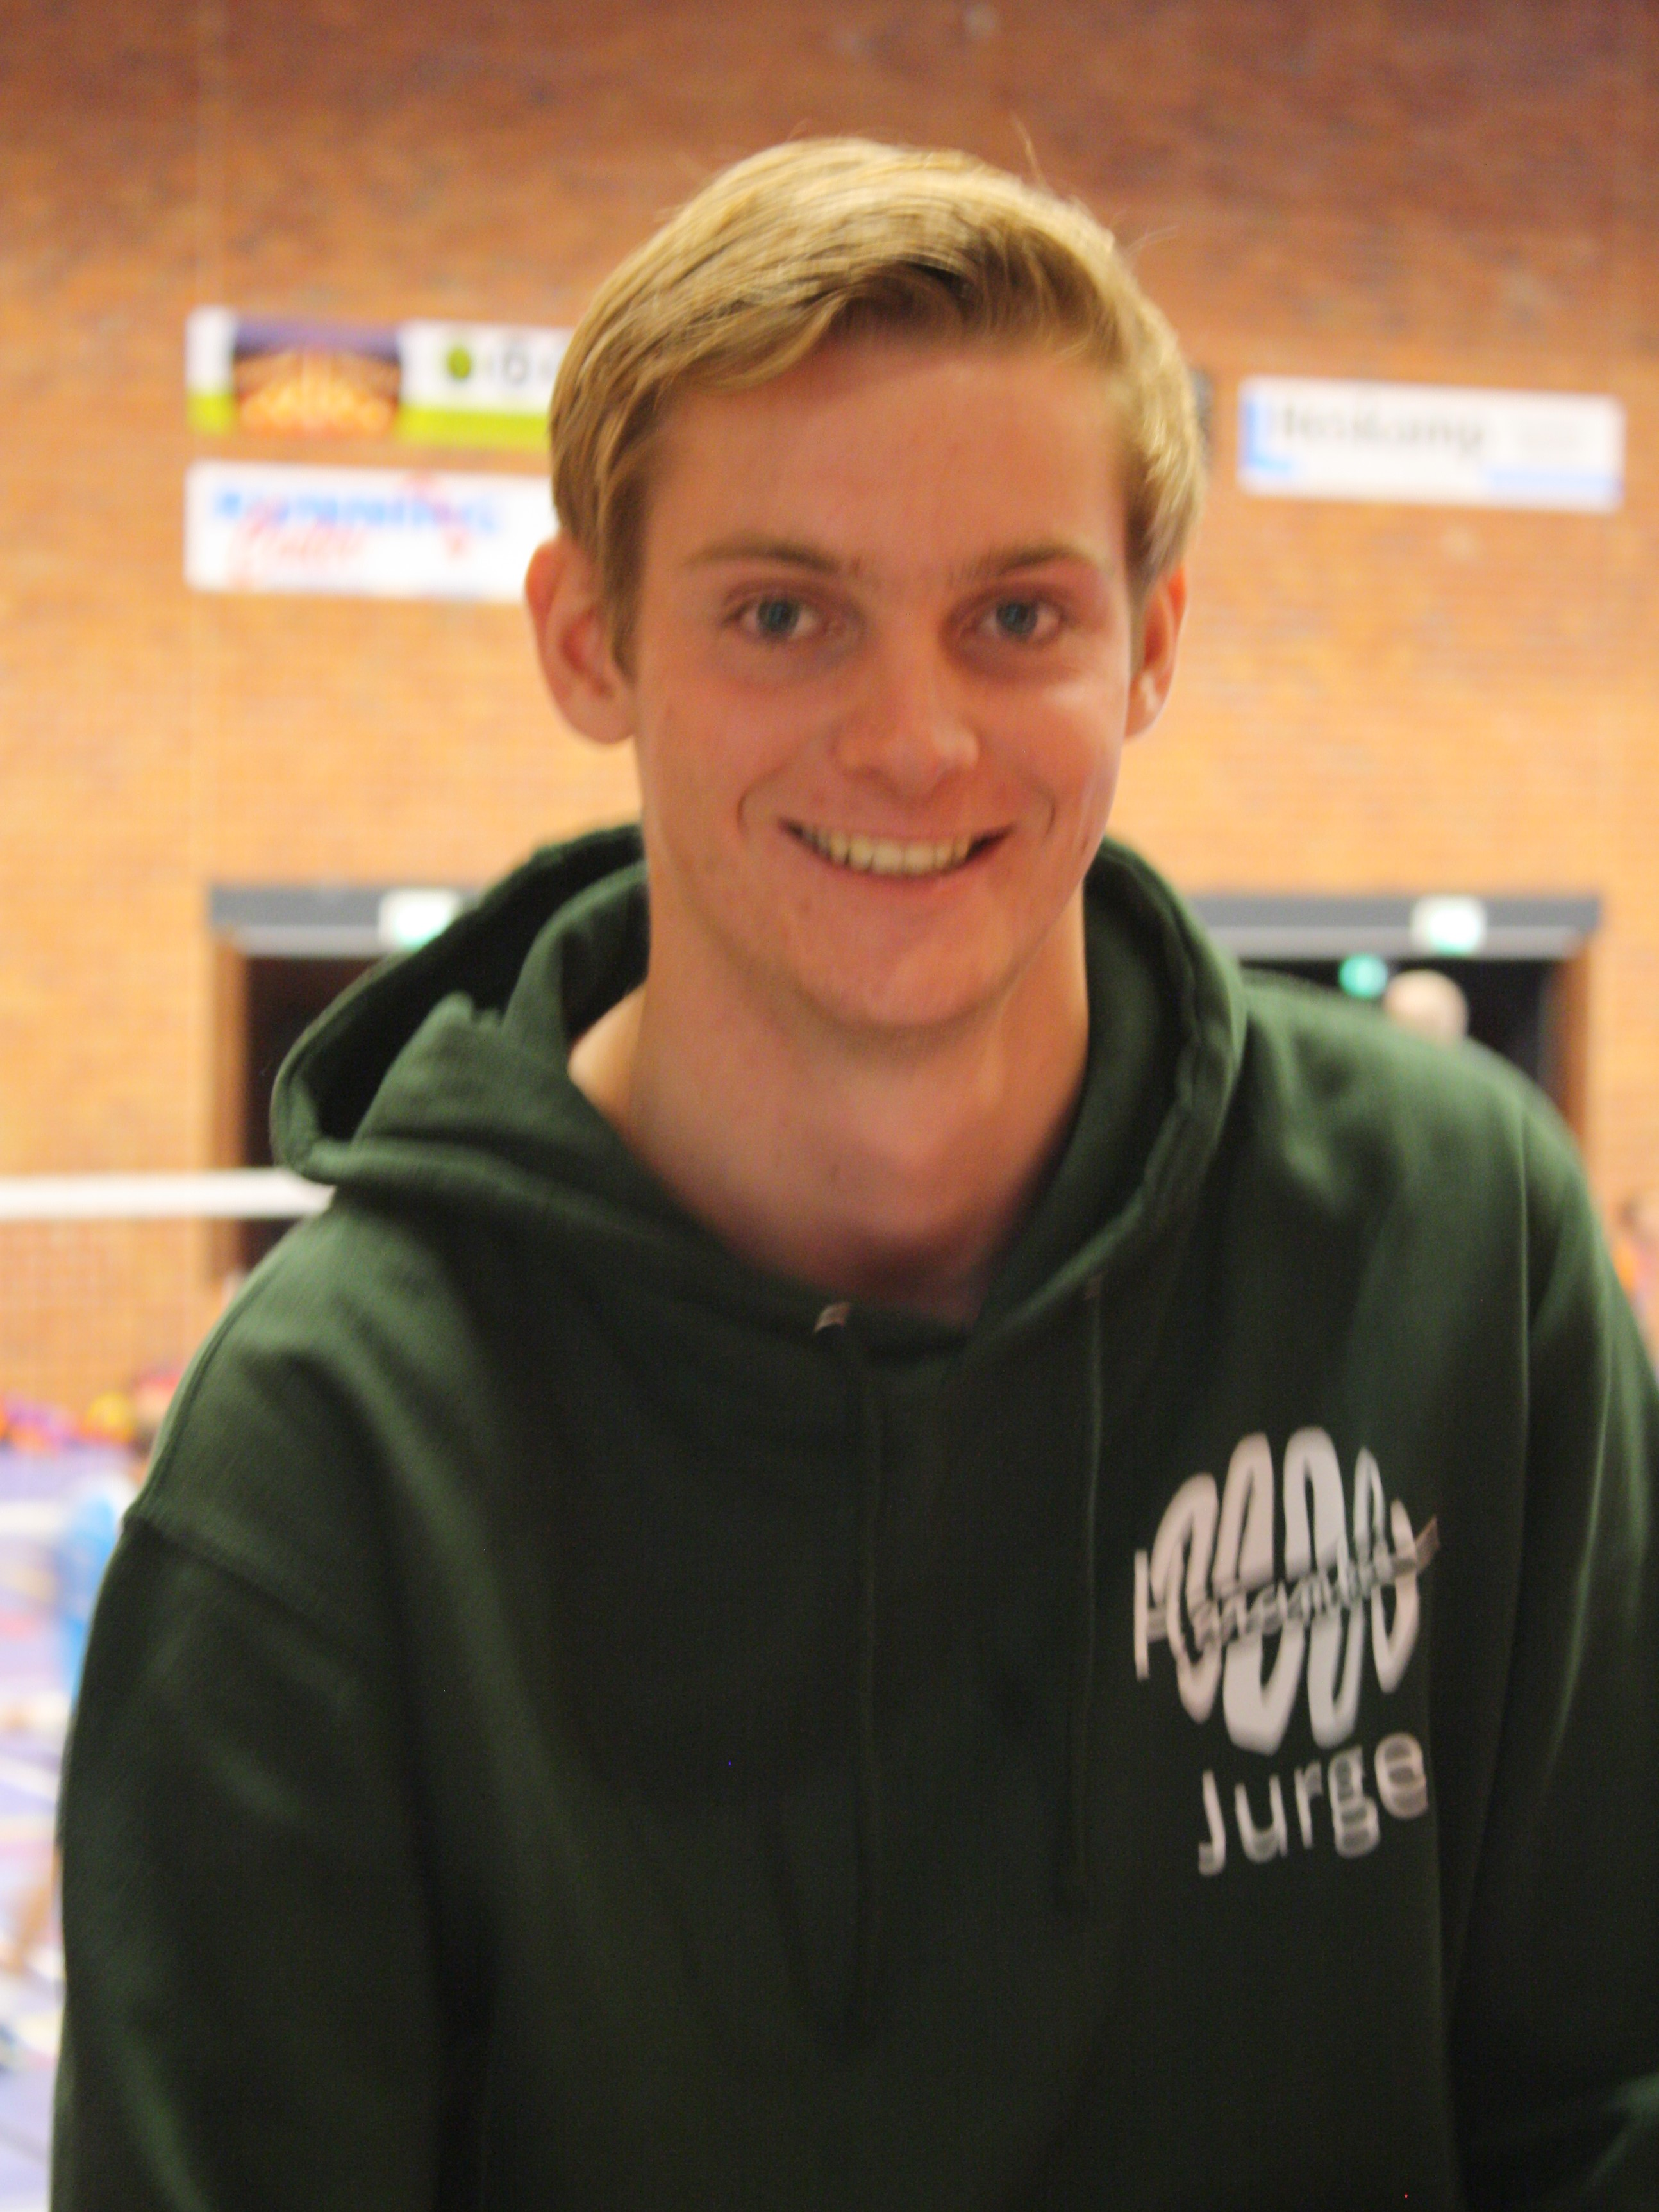 Jurgen Roman